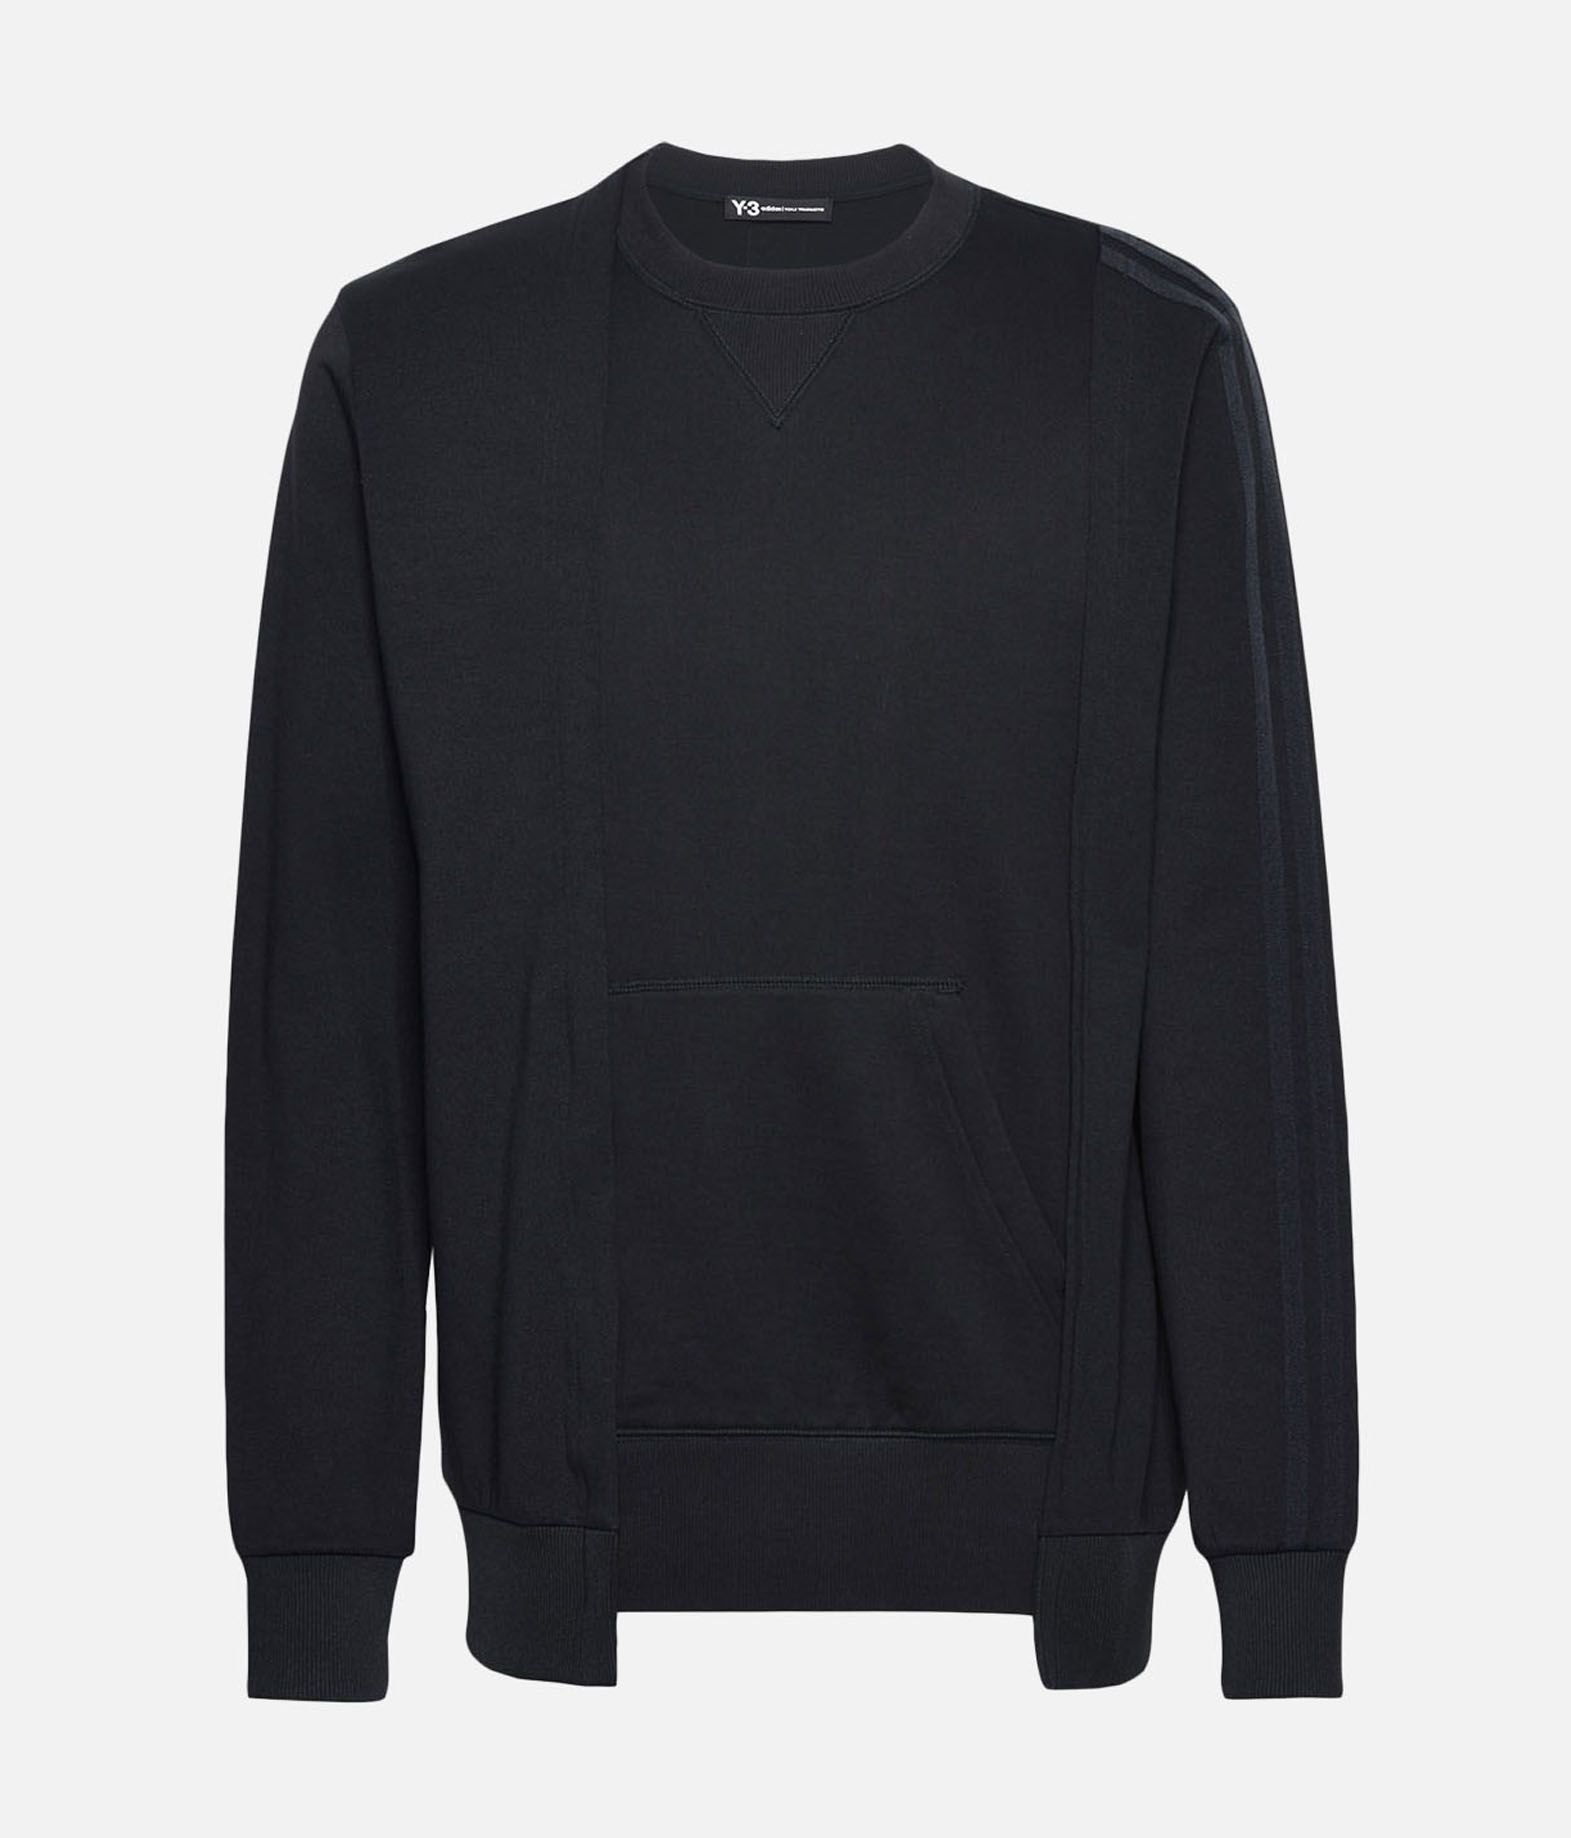 Y-3 Y-3 Patchwork Sweater Felpa Uomo f